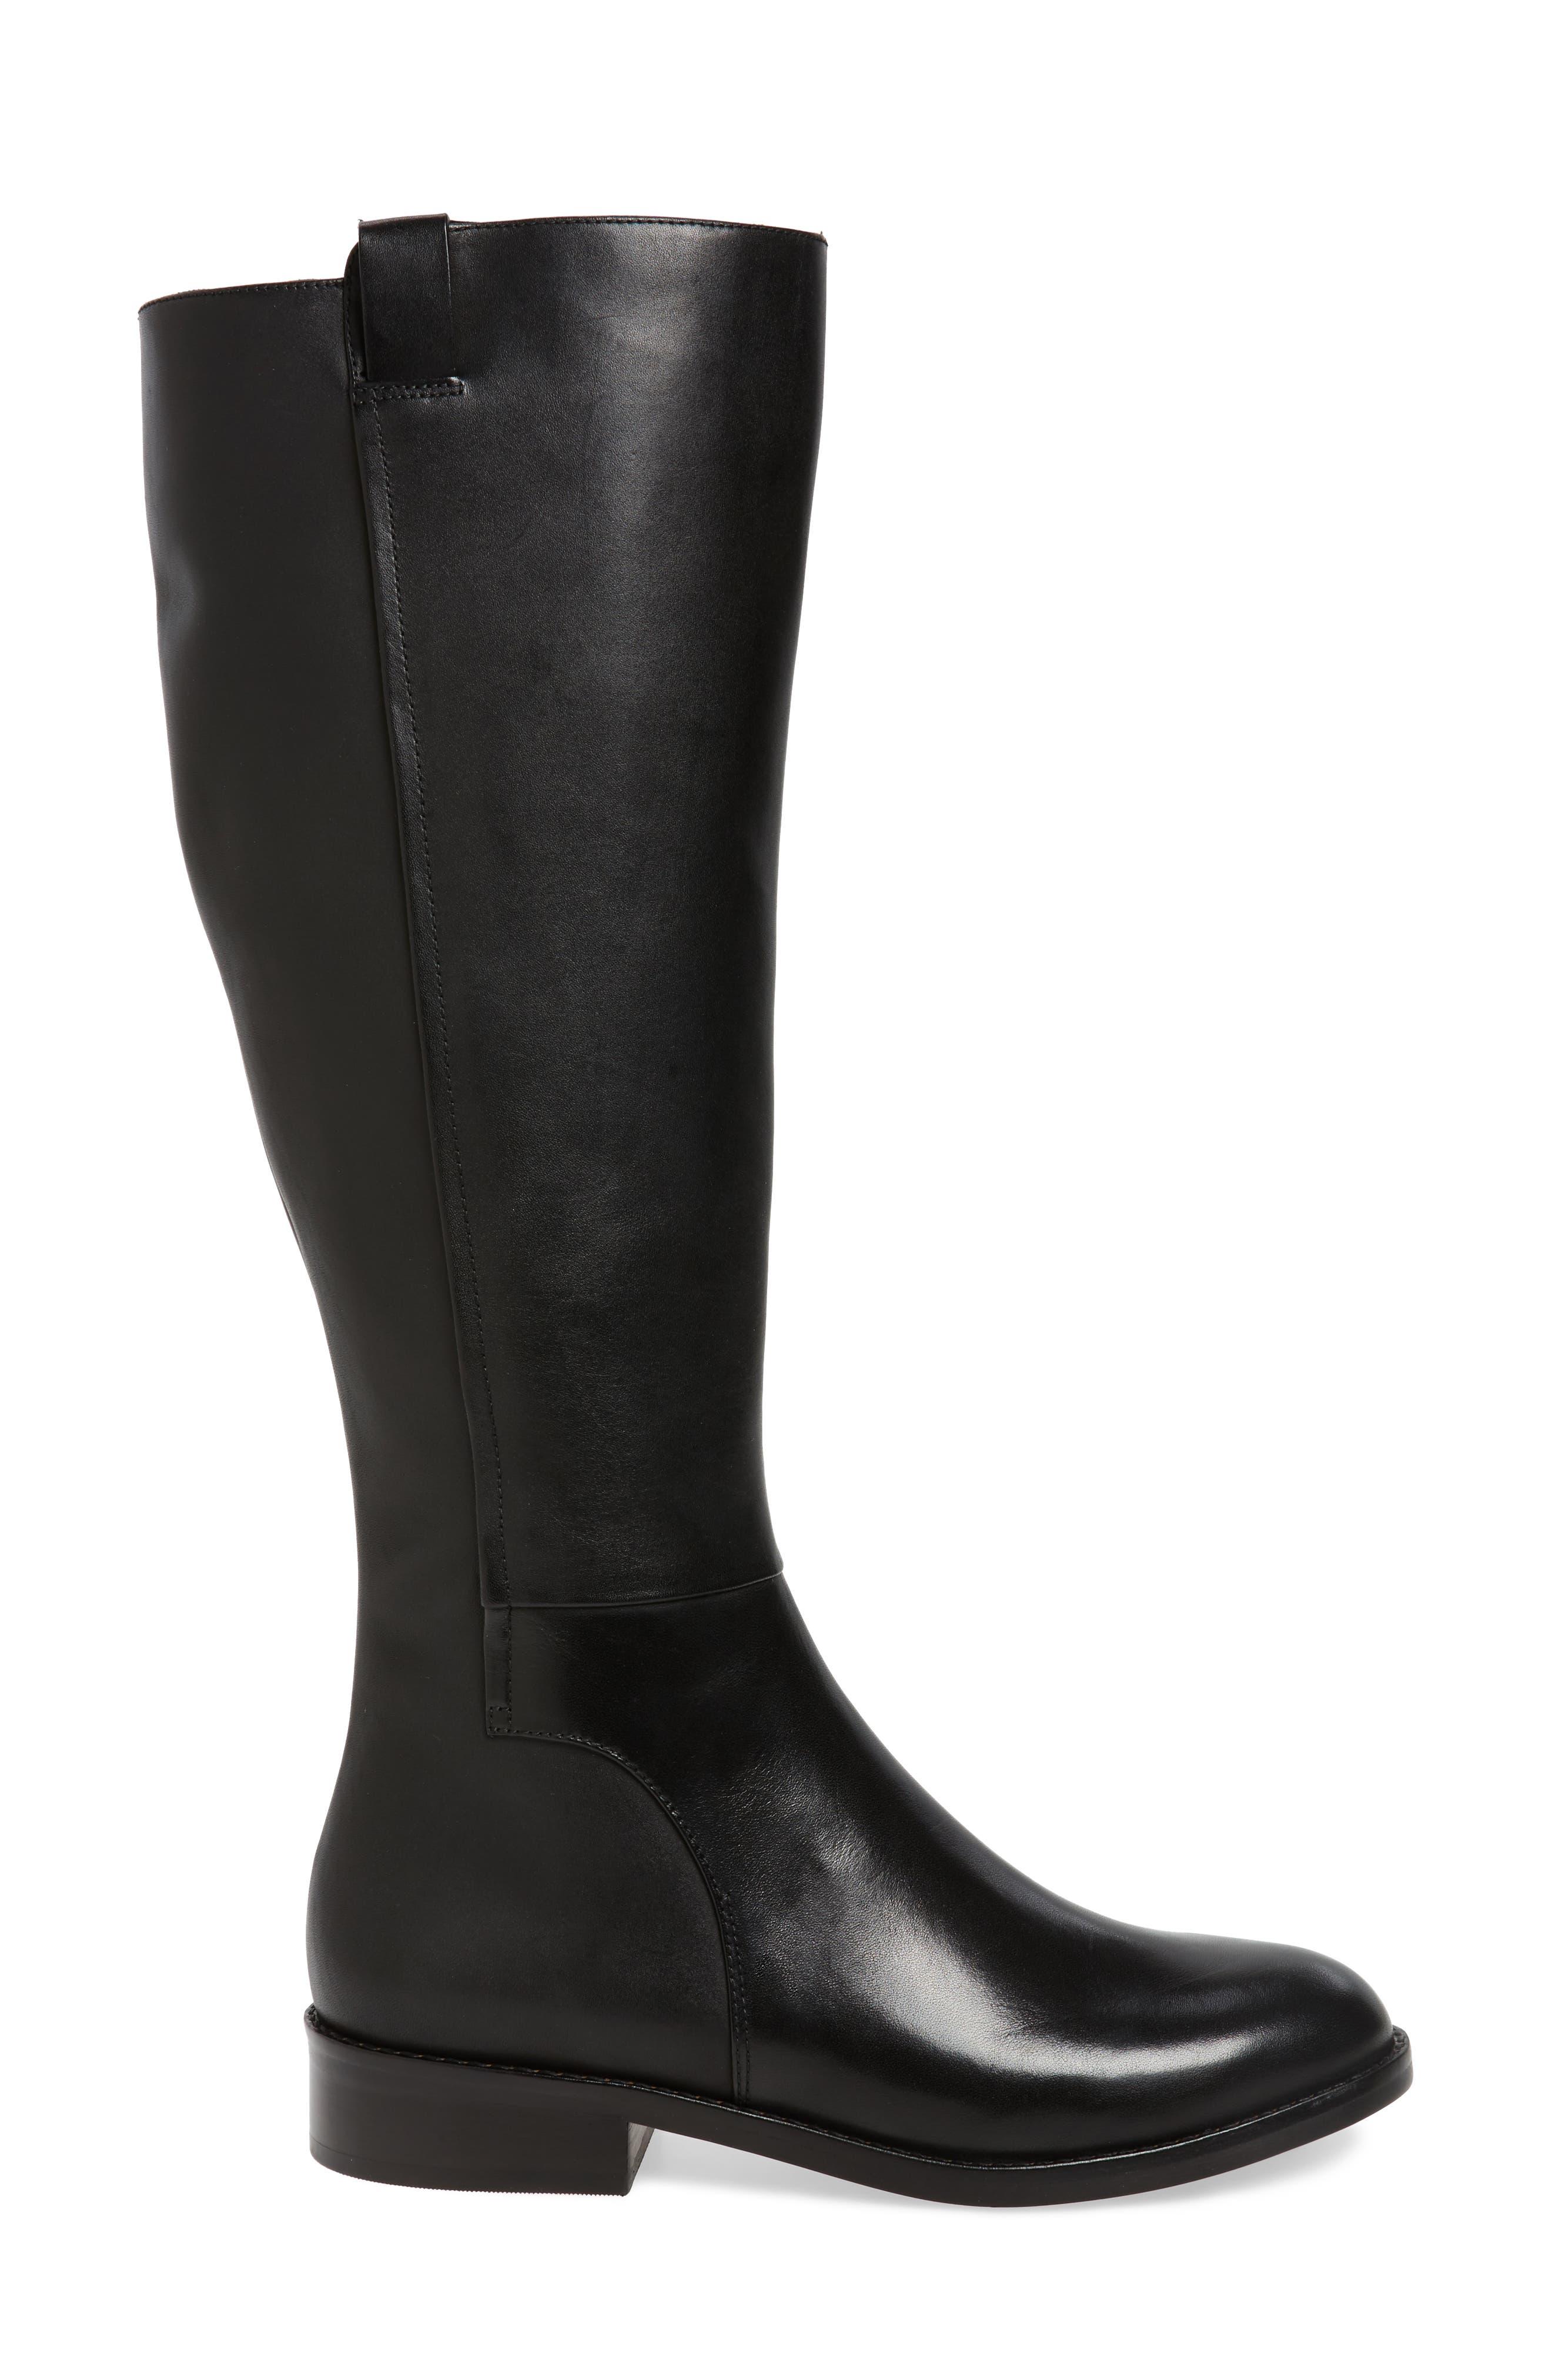 Alternate Image 3  - Cole Haan Katrina Riding Boot (Women) (Regular & Wide Calf)